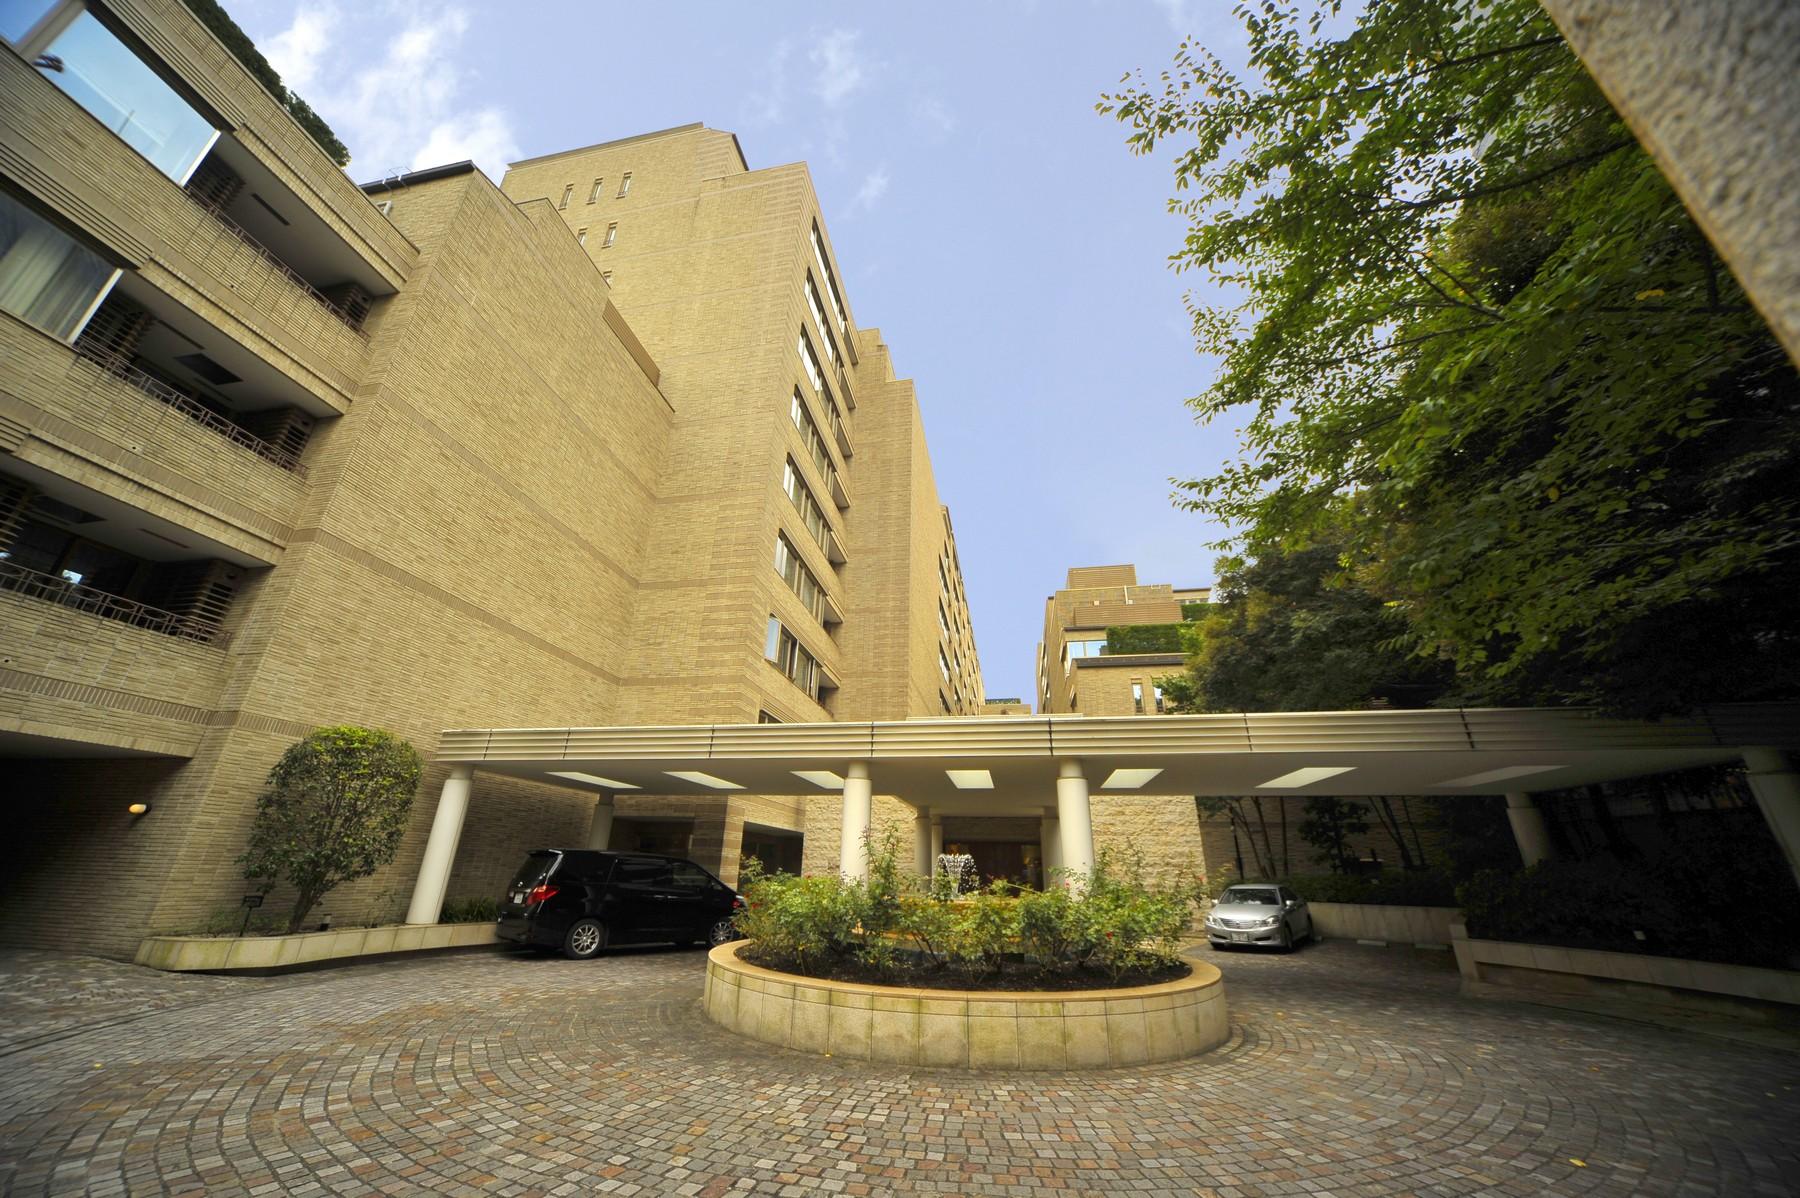 Apartamento para Venda às The House Minami Azabu Minamiazabu, Minato-Ku, Tokyo Japão